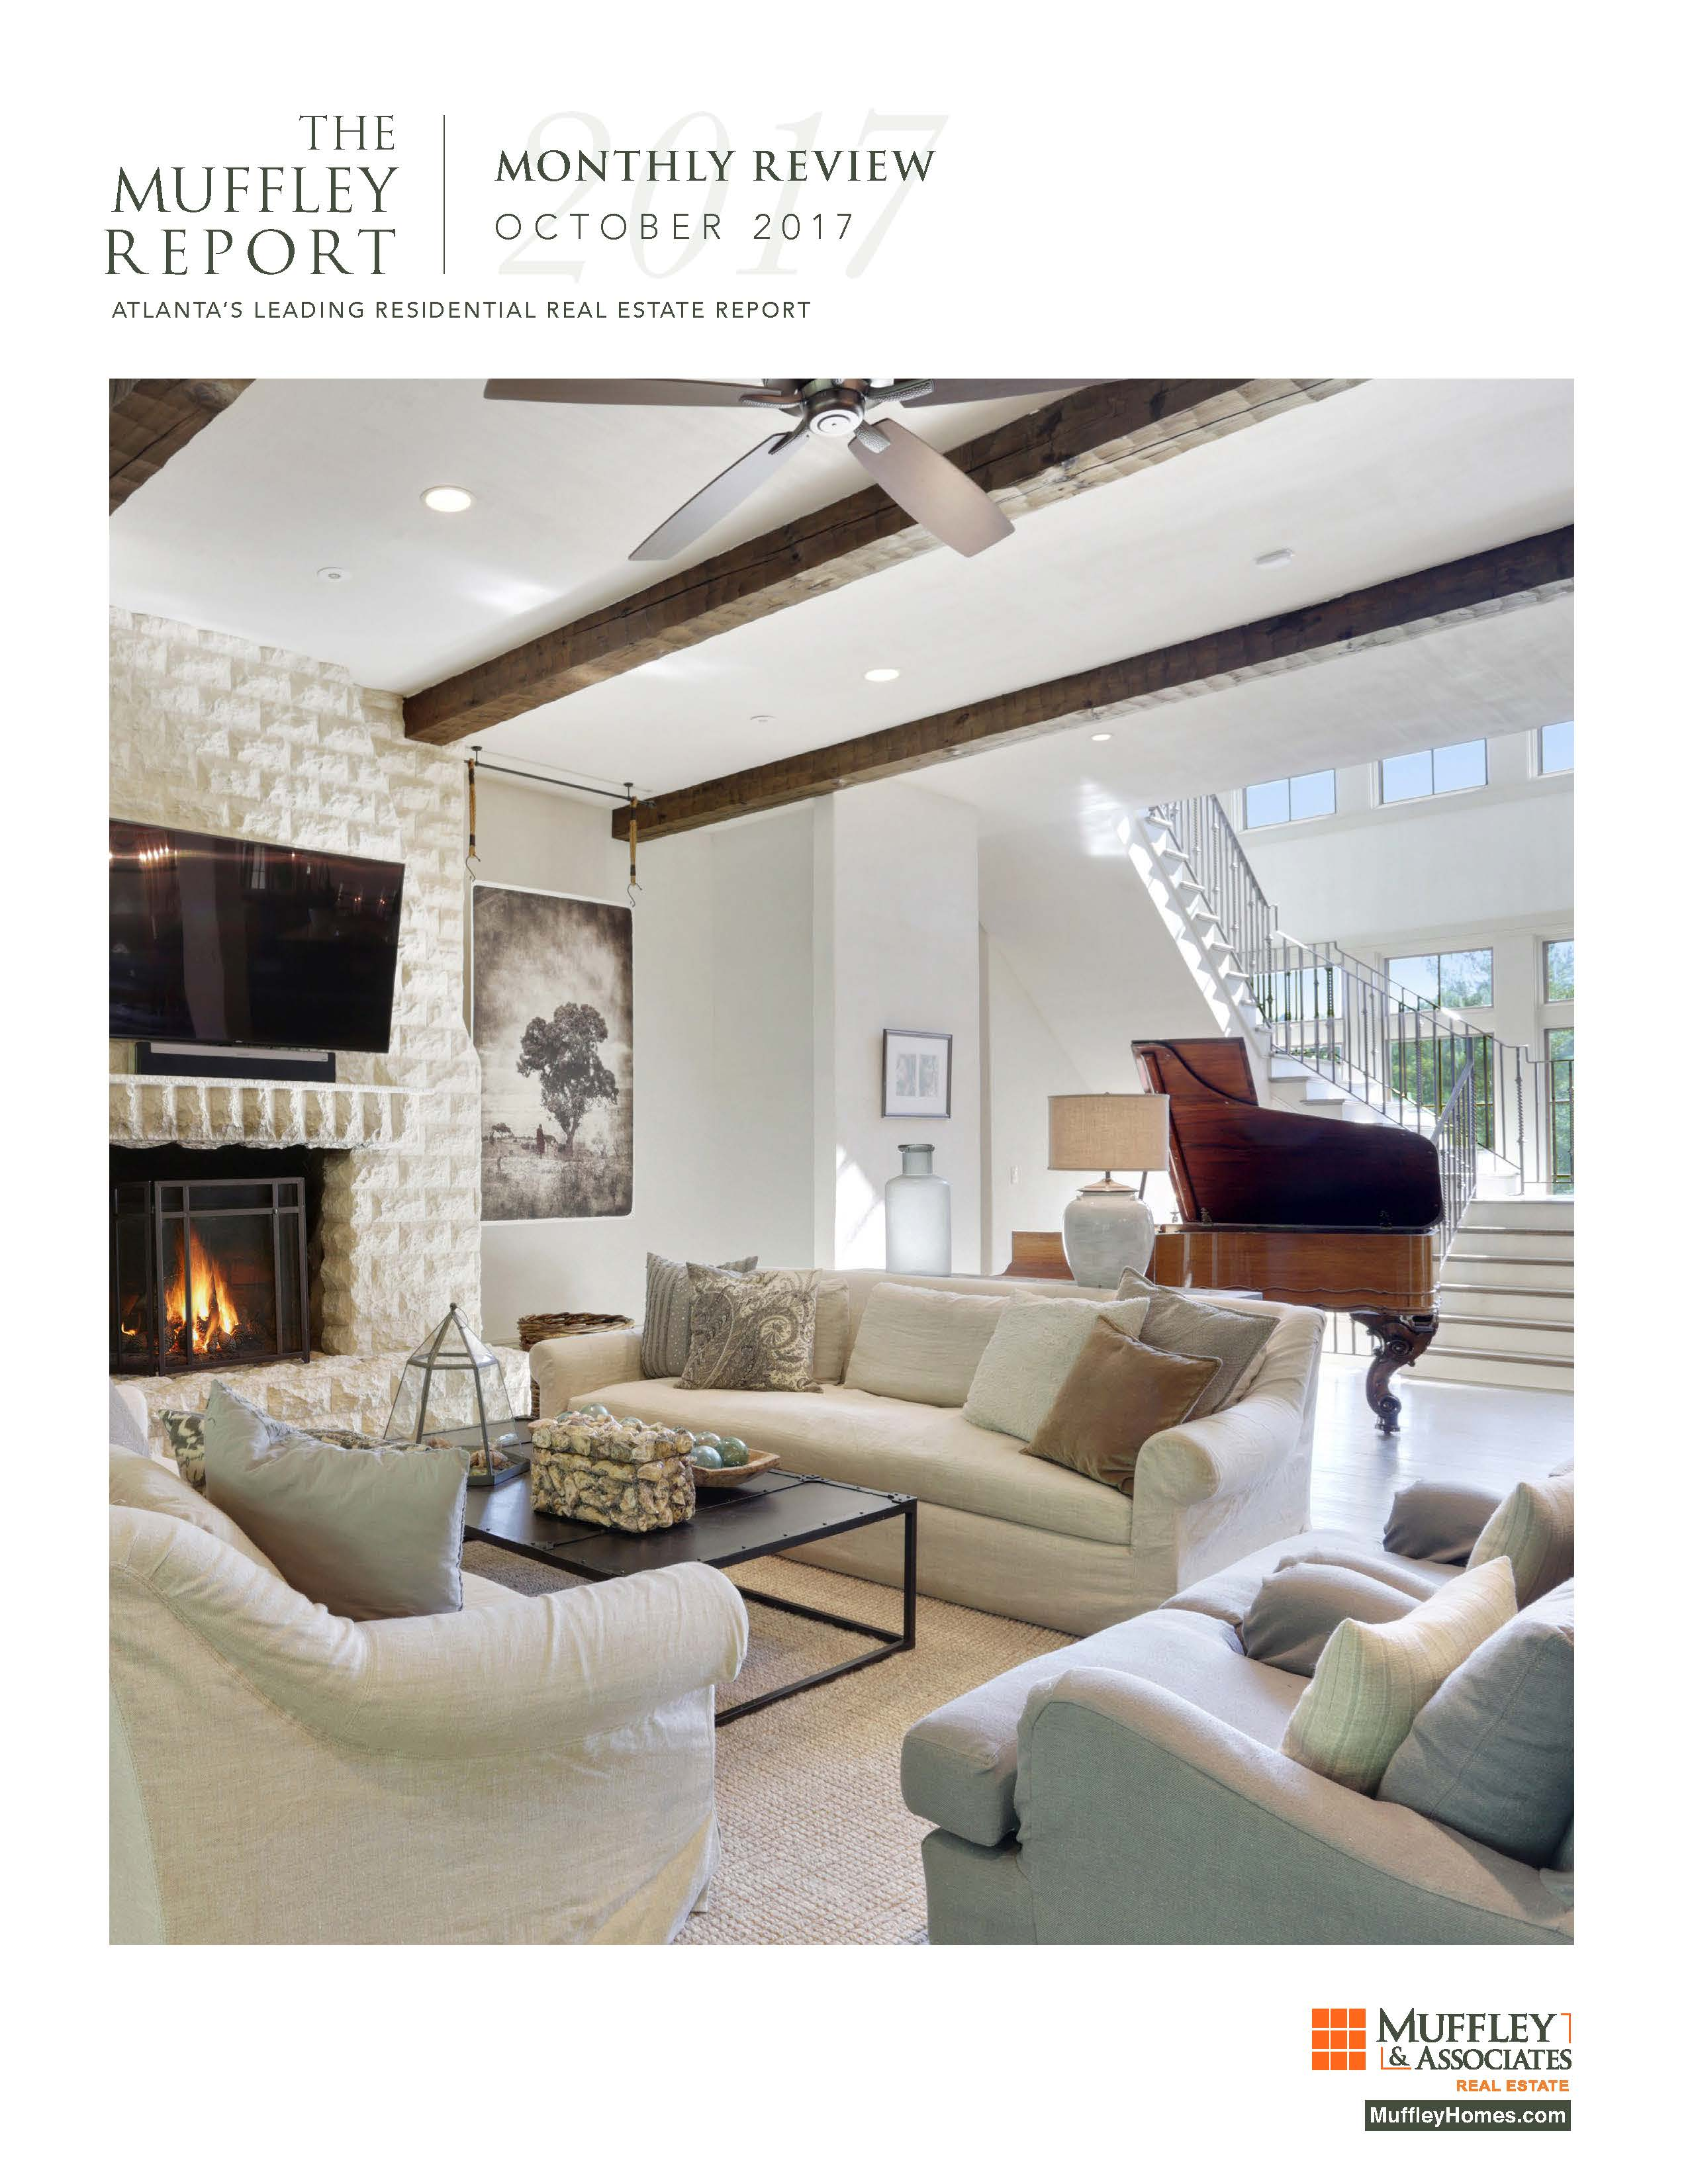 Muffley Home Report, Atlanta's Leading Residential Real Estate Report